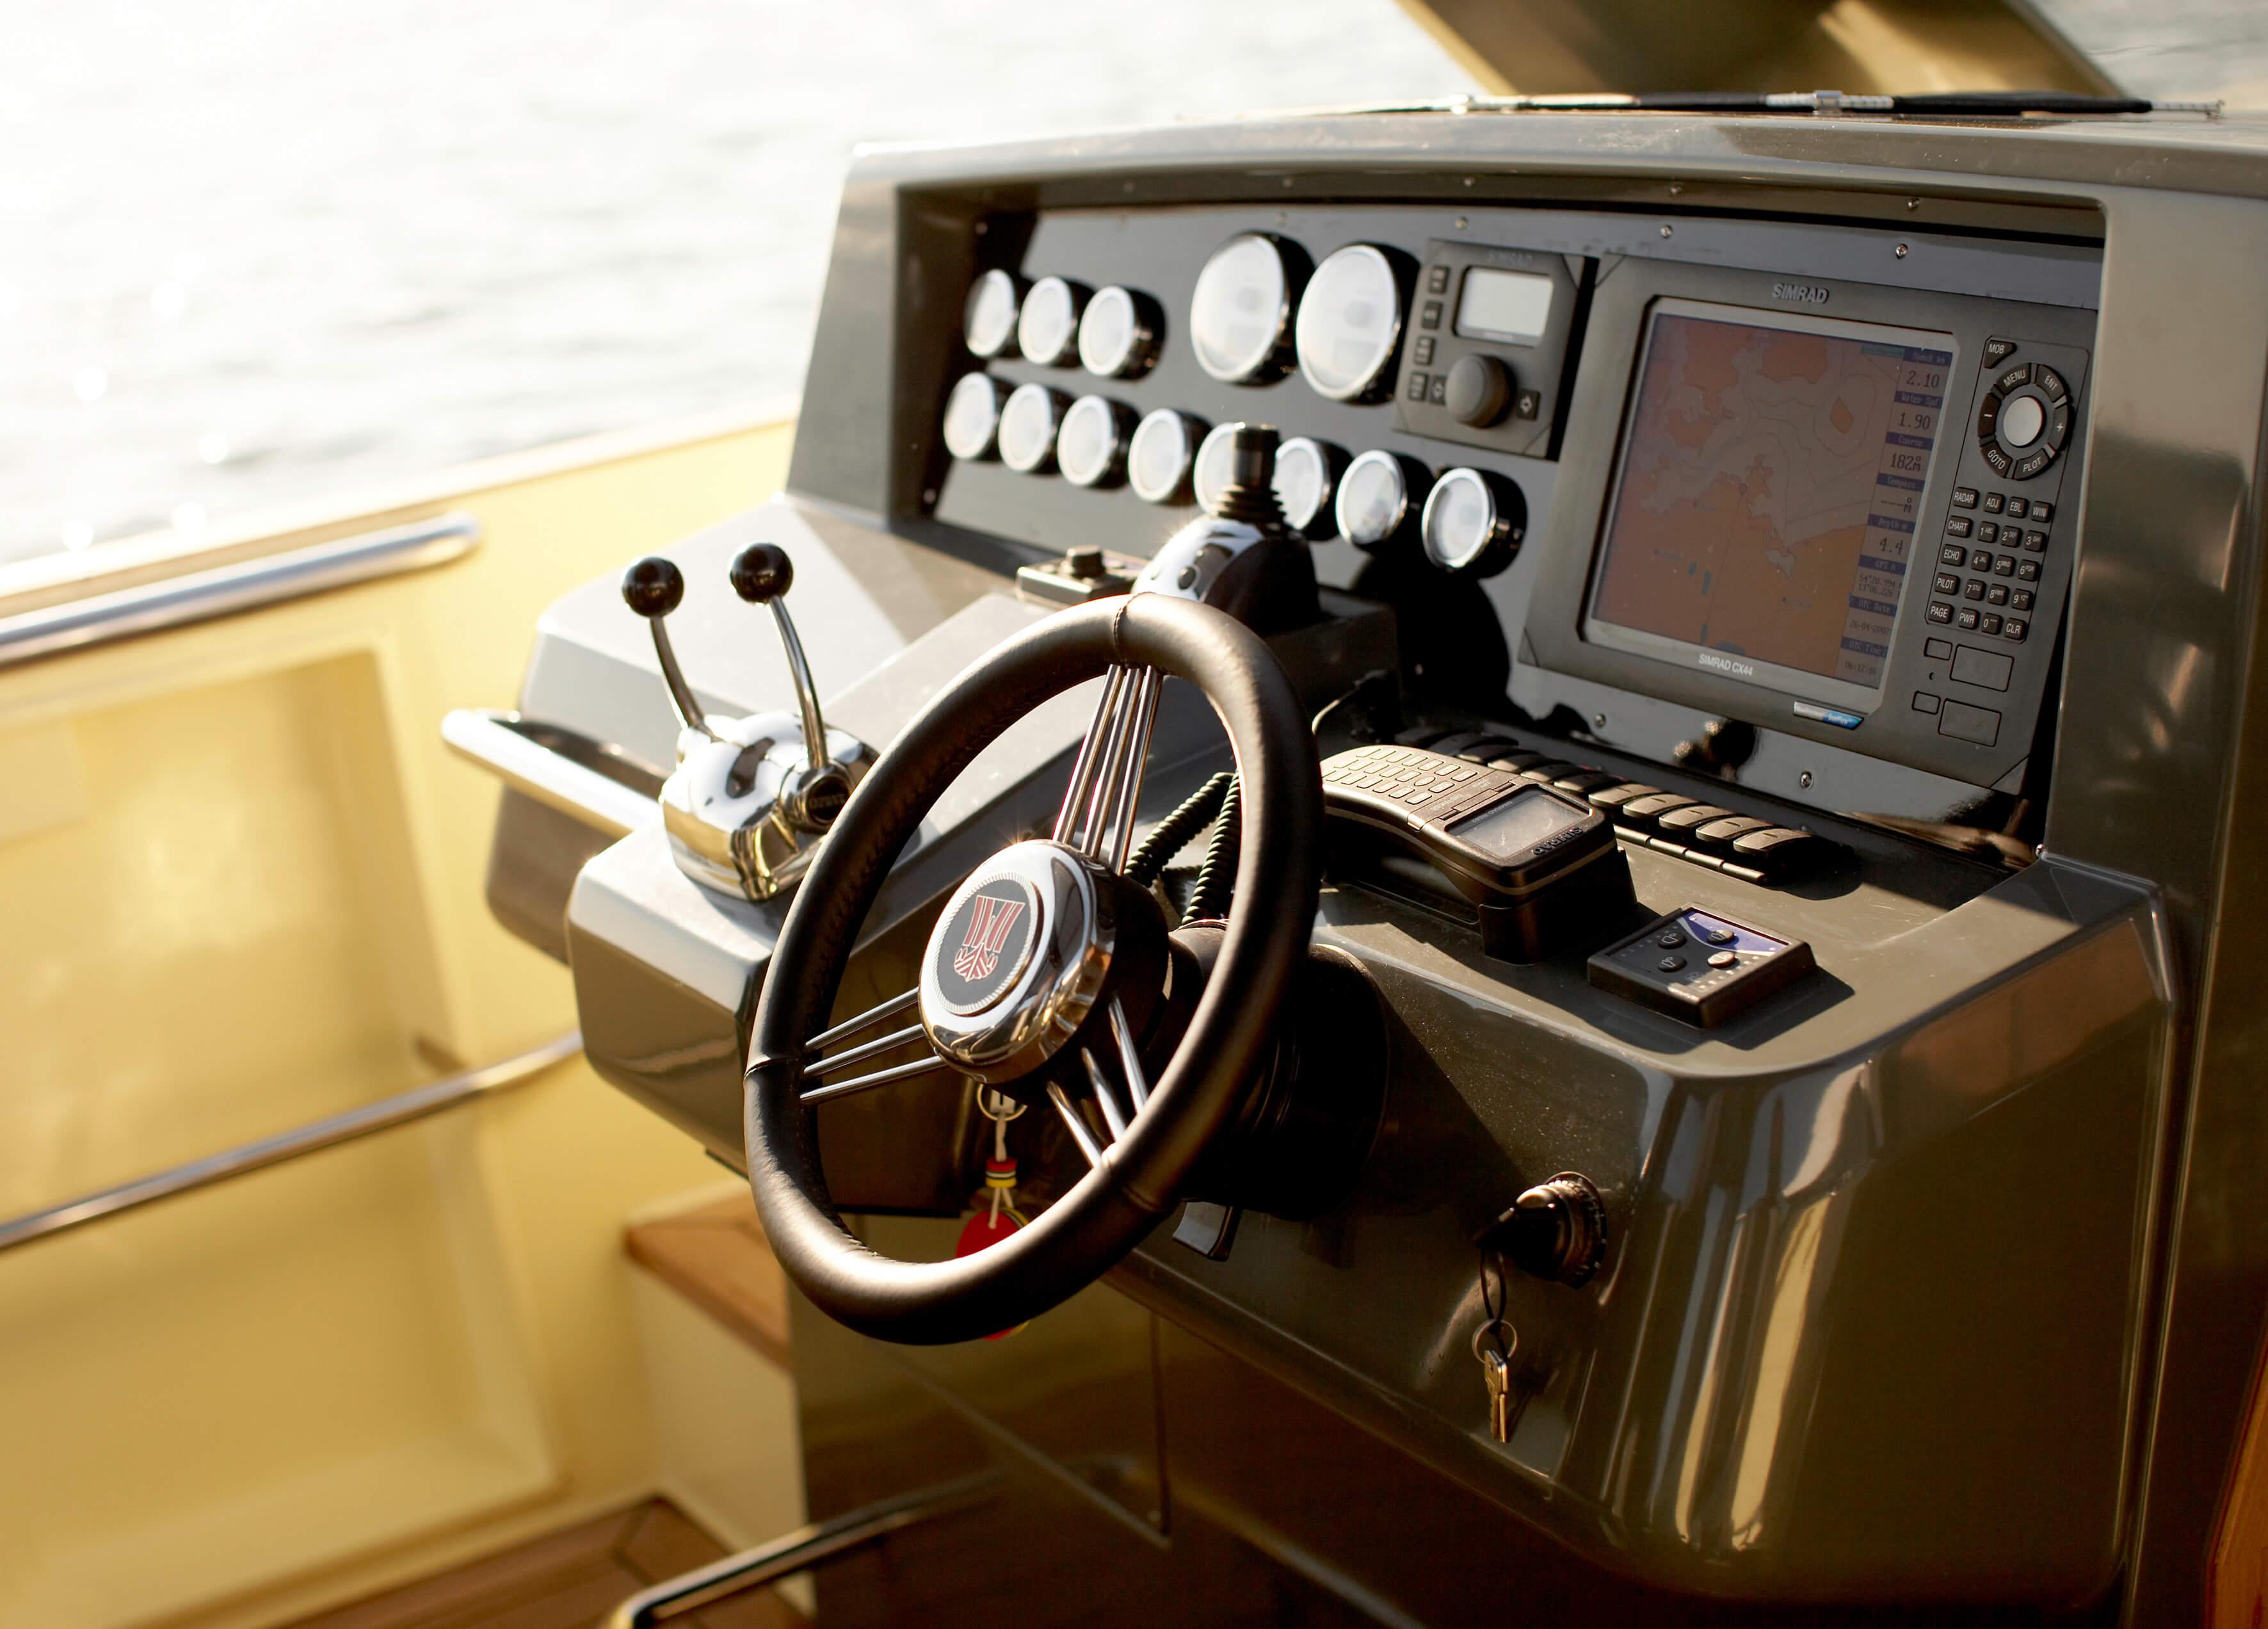 Fjord 40 open Innenansicht Cockpit | Steuerrad, Navigationsinstrumente | Fjord